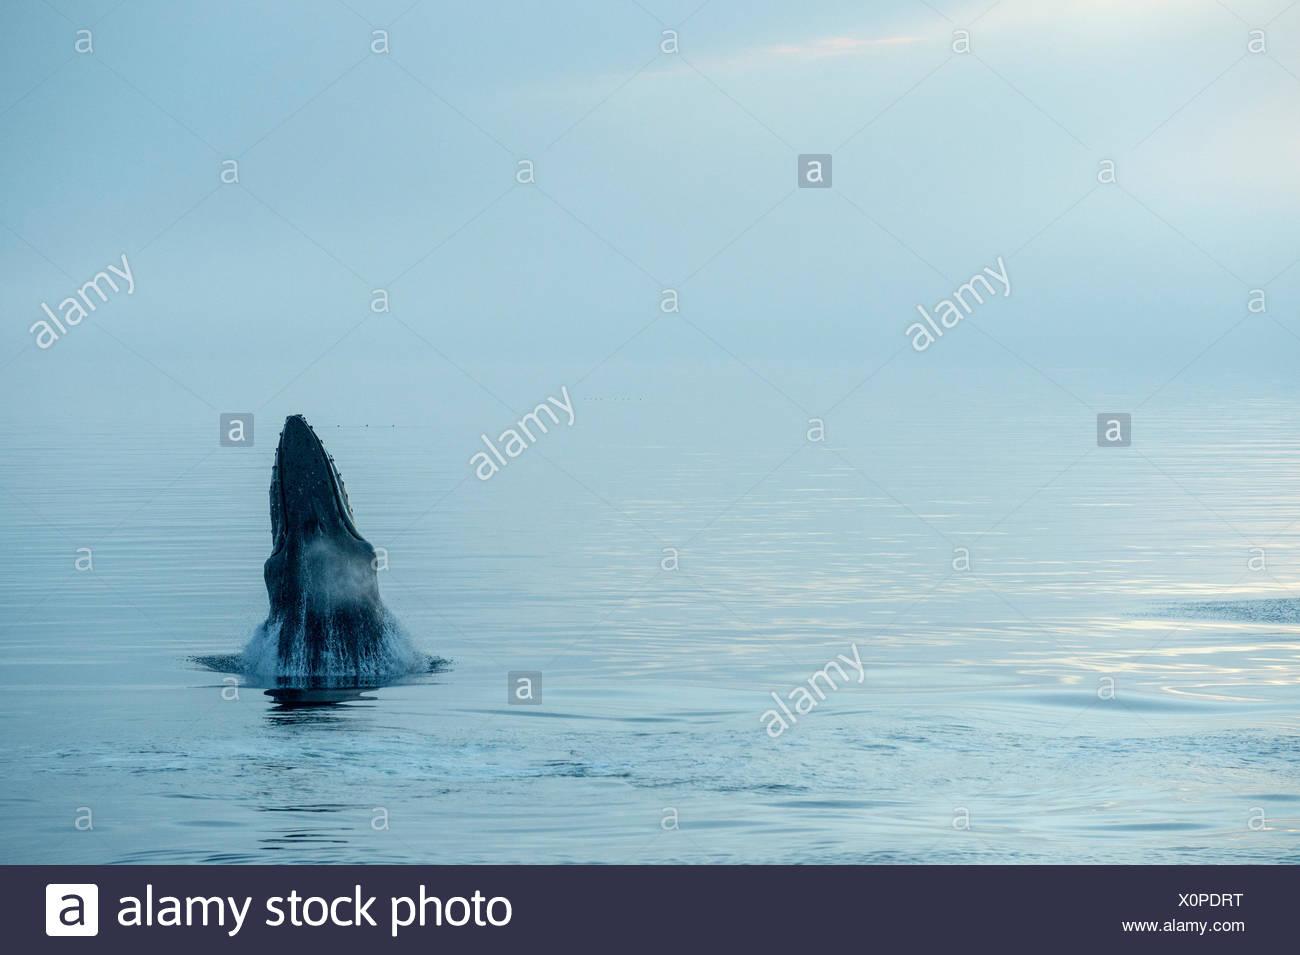 A humpback whale (Megaptera novaeangliae) beginning to breach near Petersburg, Alaska. - Stock Image